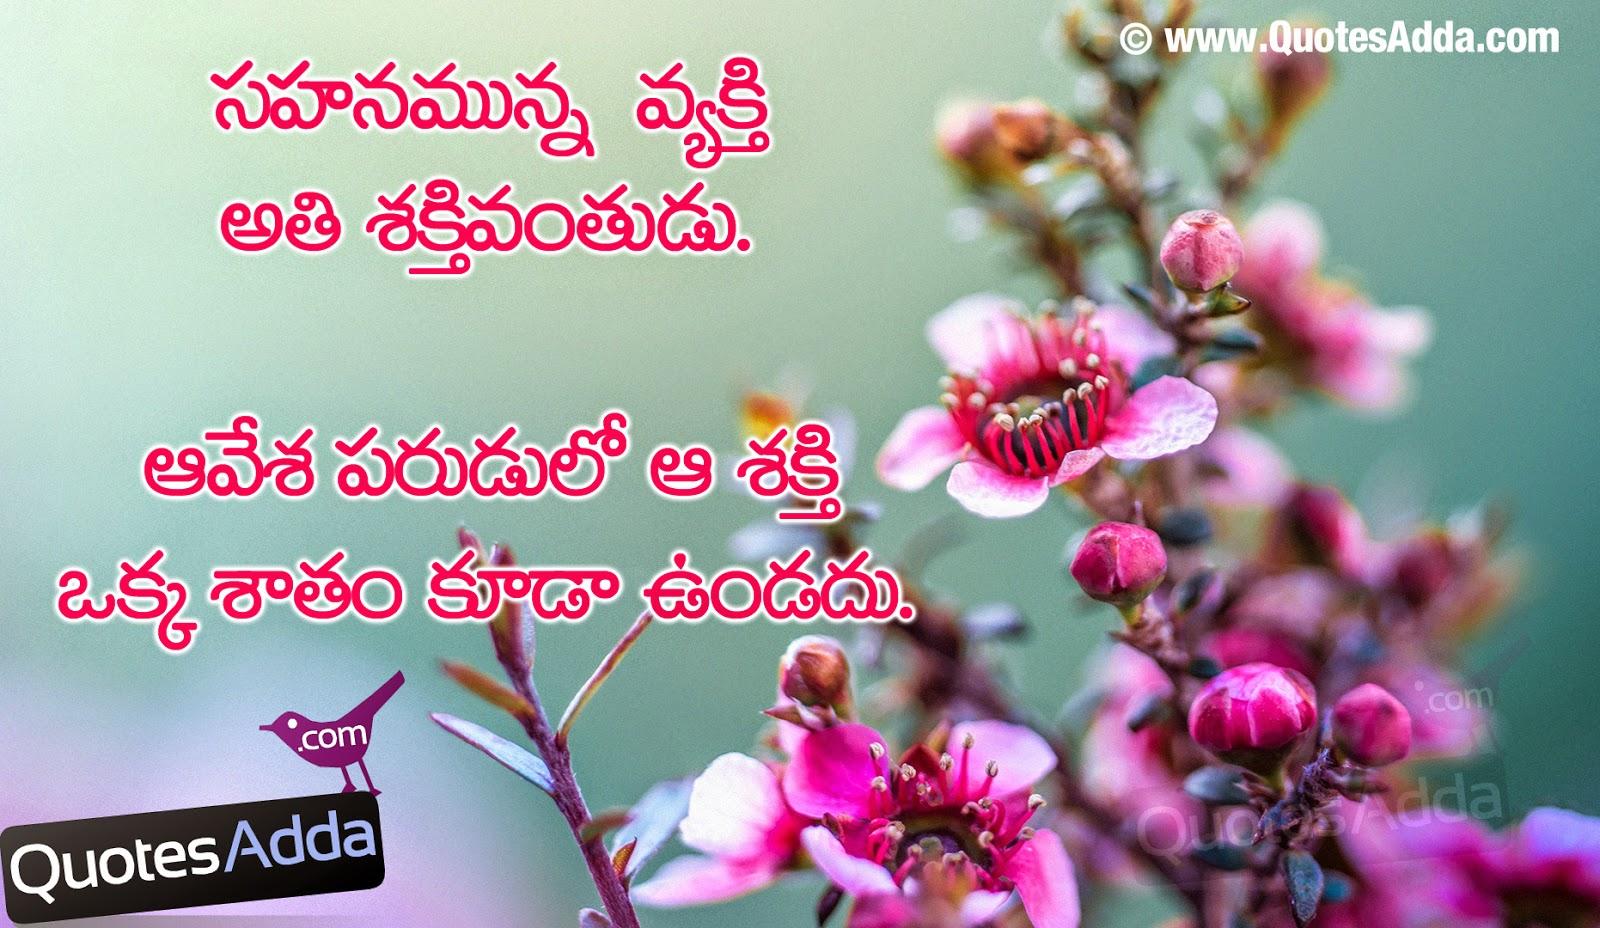 Beautiful Heart Touching Friendship Quotes